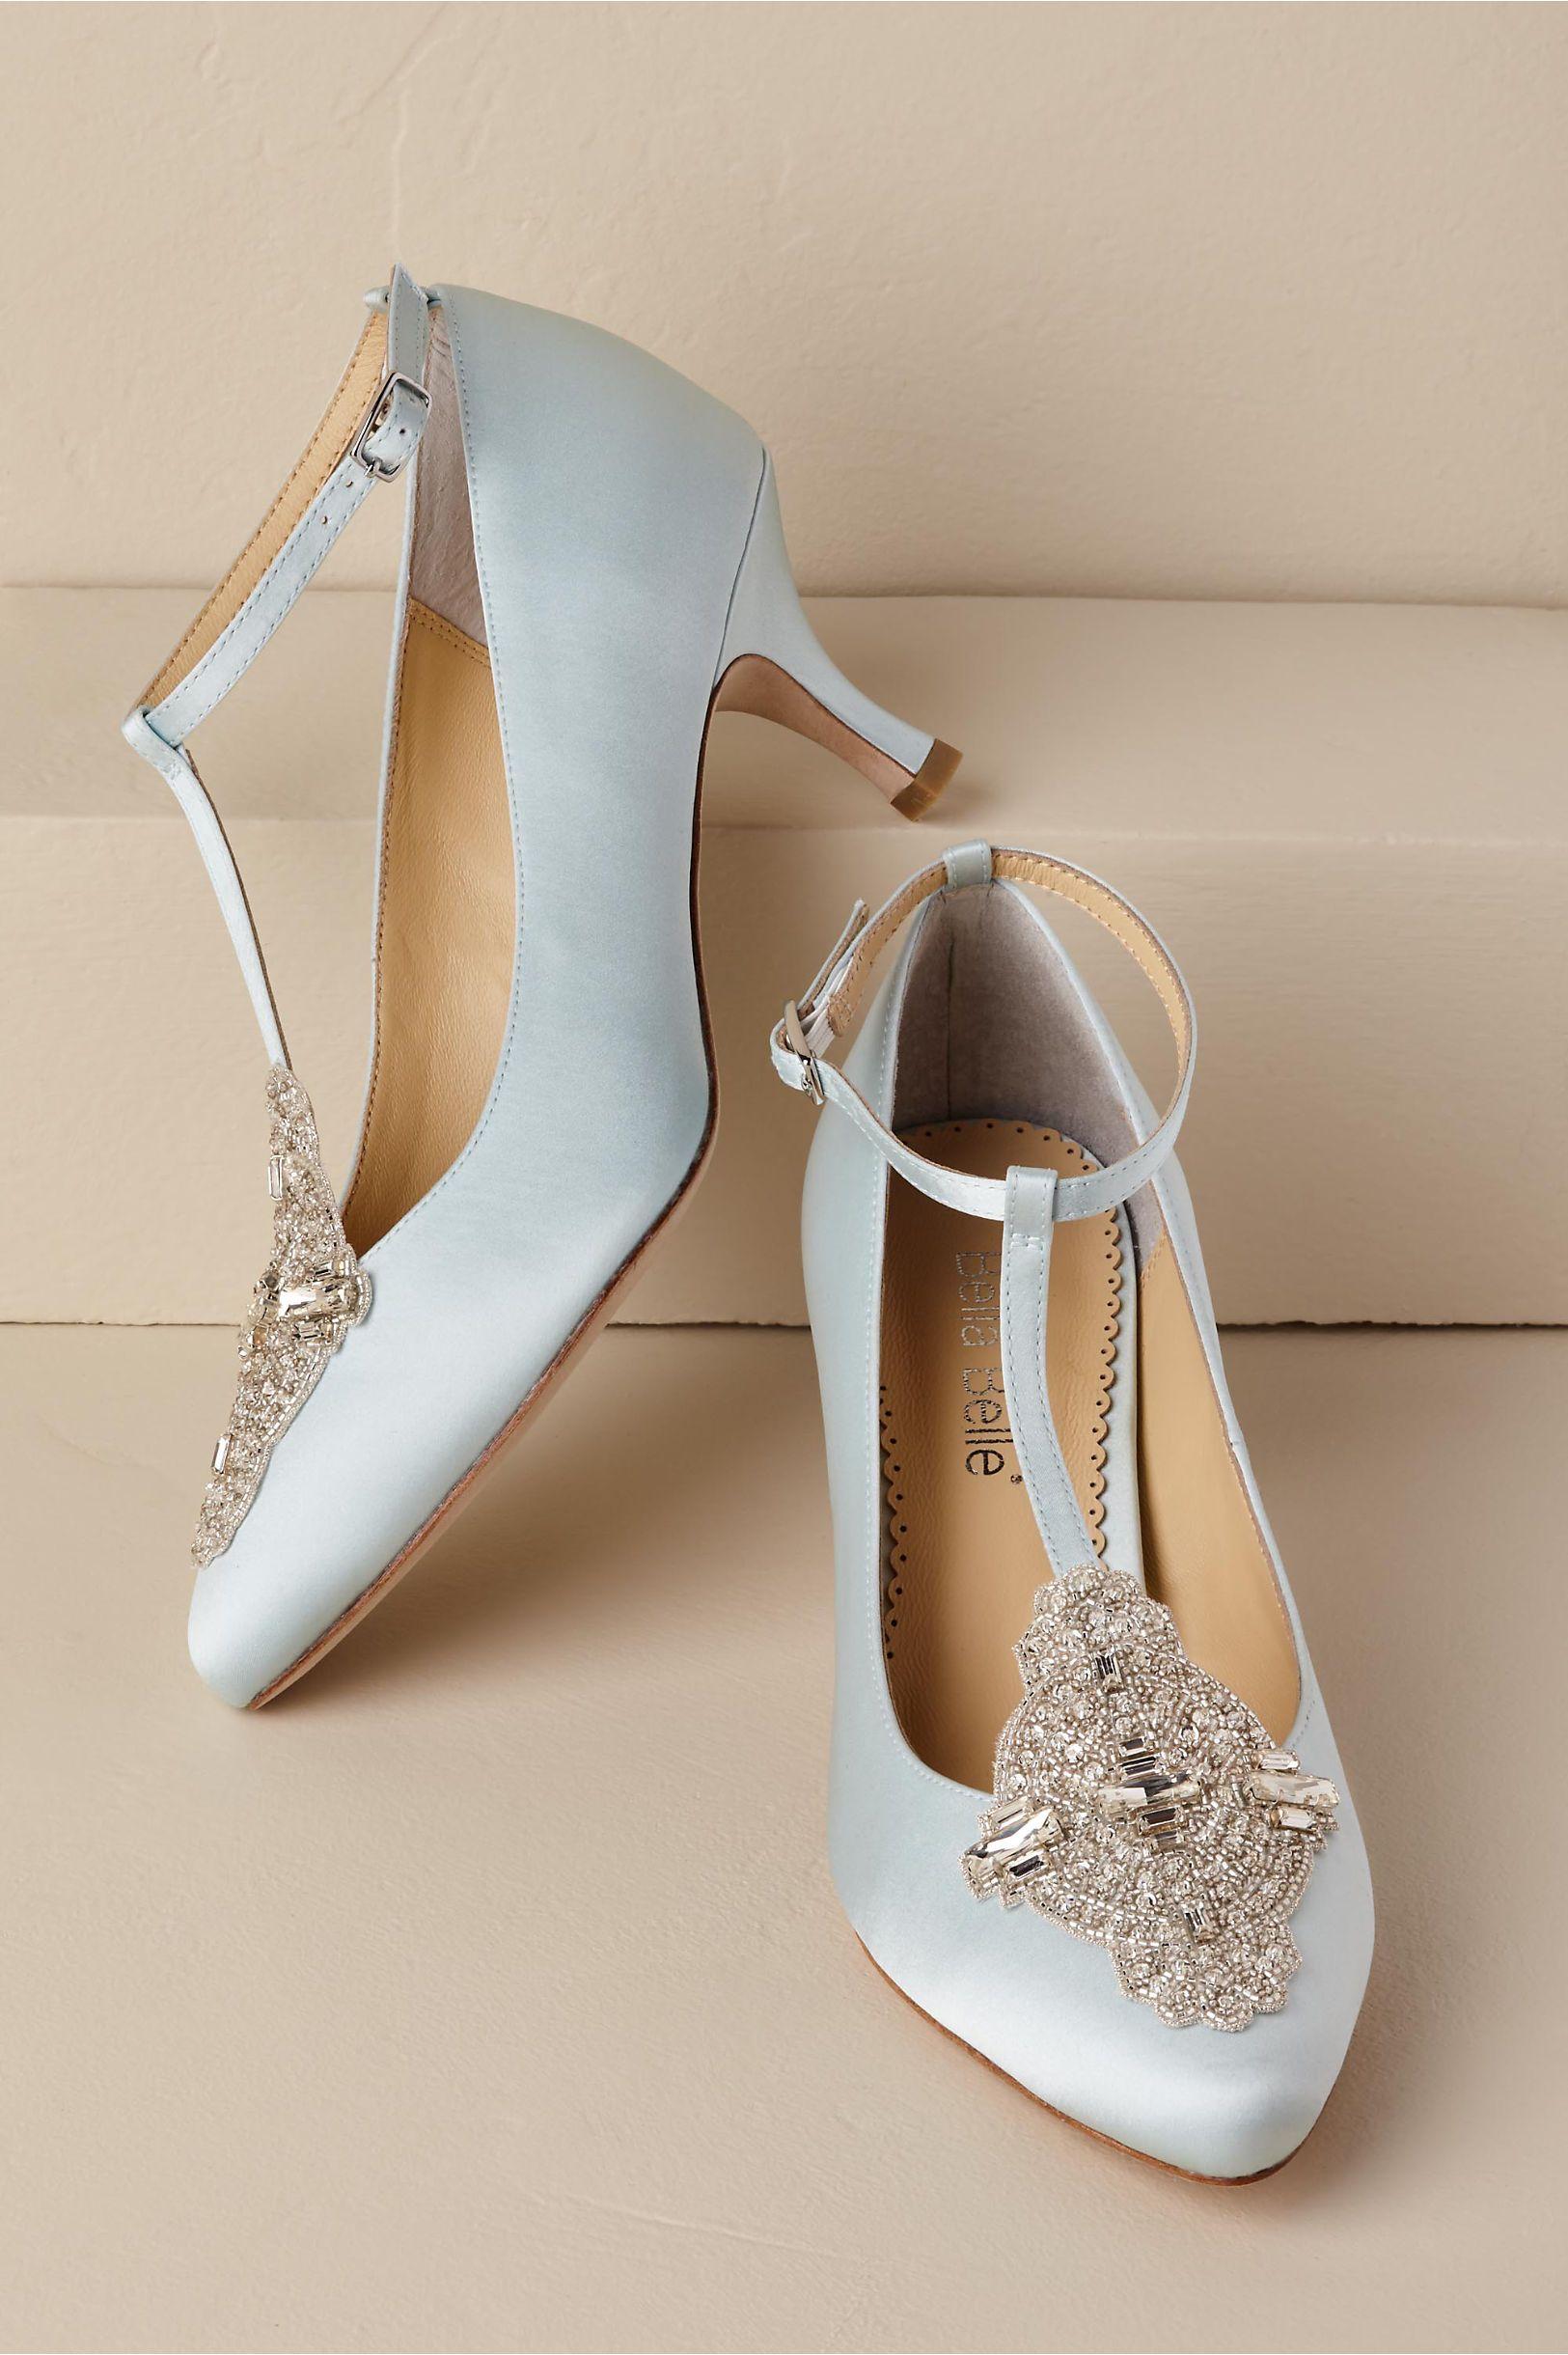 Bhldn S Bella Belle Annalise Heels In Blue Best Bridal Shoes Bridal Shoes Wedding Shoes